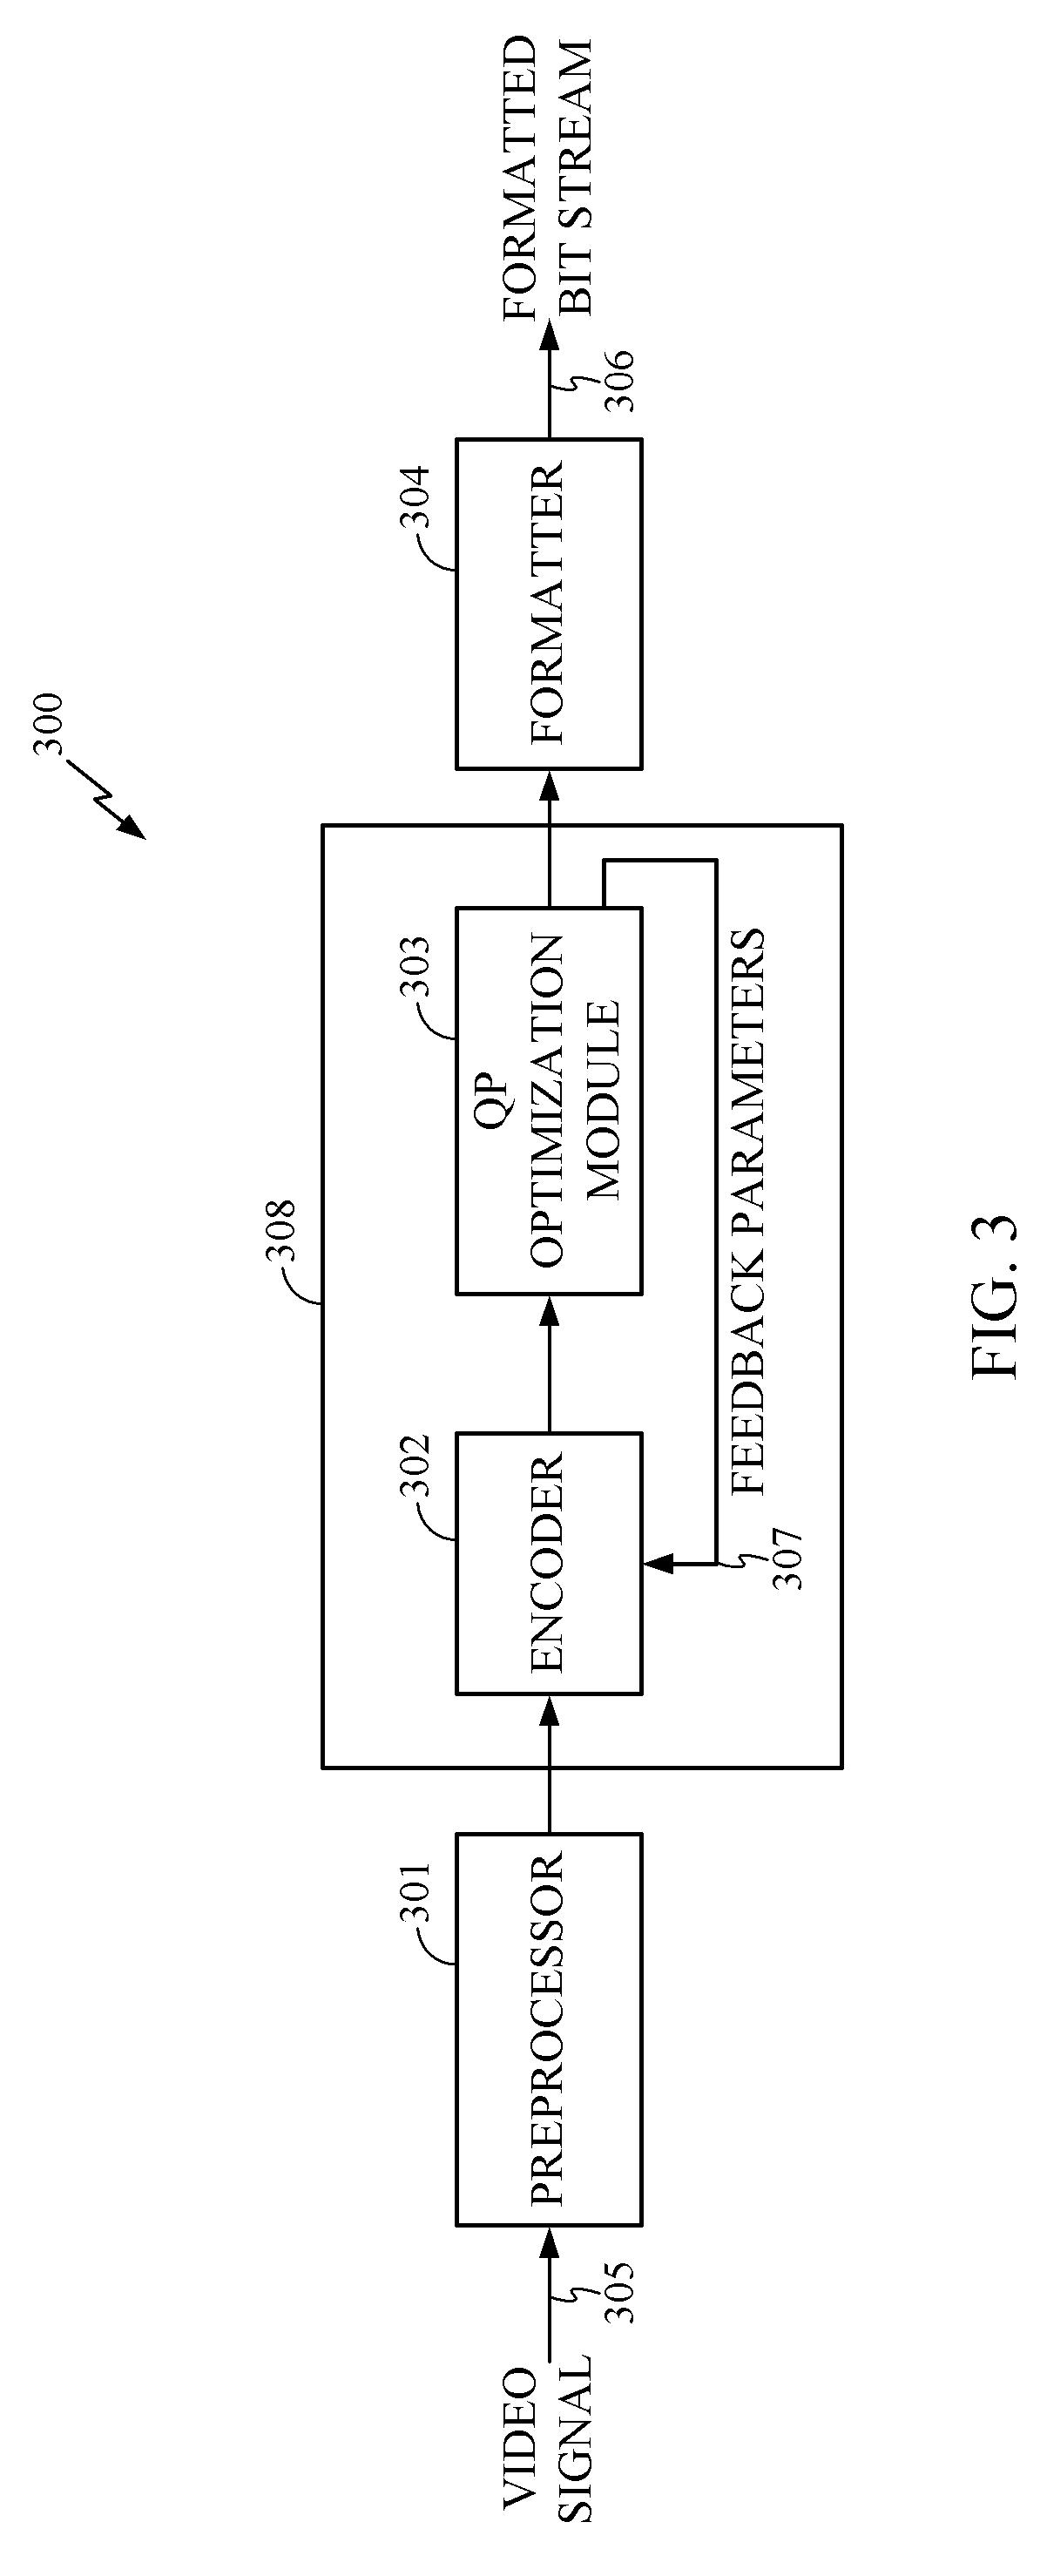 Patent Us20090213930 Fast Macroblock Delta Qp Decision Google H 261 Encoder Block Diagram Drawing